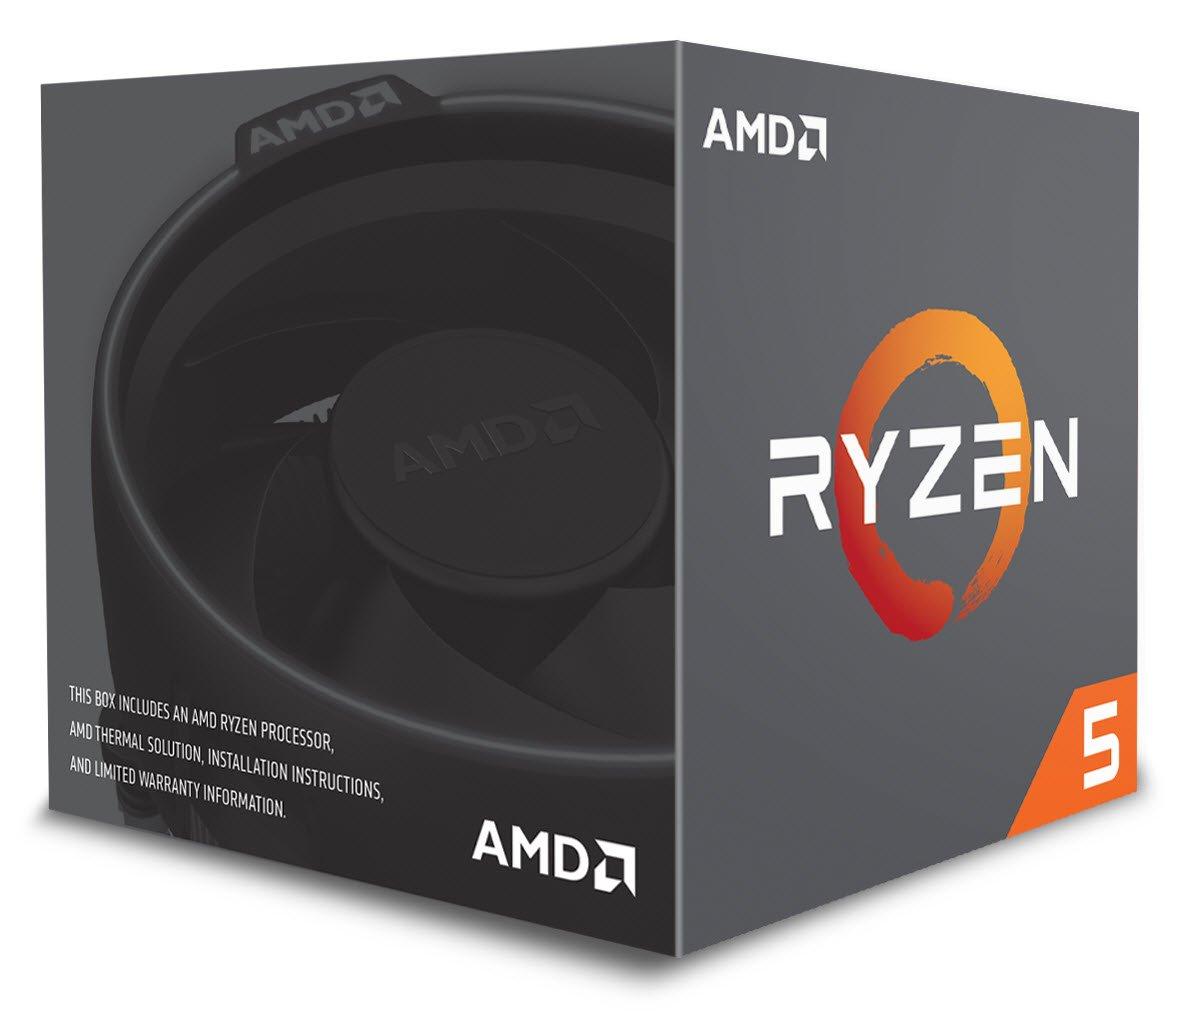 AMD Ryzen 5 2600X - Procesador con disipador de calor Wraith Spire (19 MB, 6 núcleos, velocidad de 4.25 GhZ, 95 W)